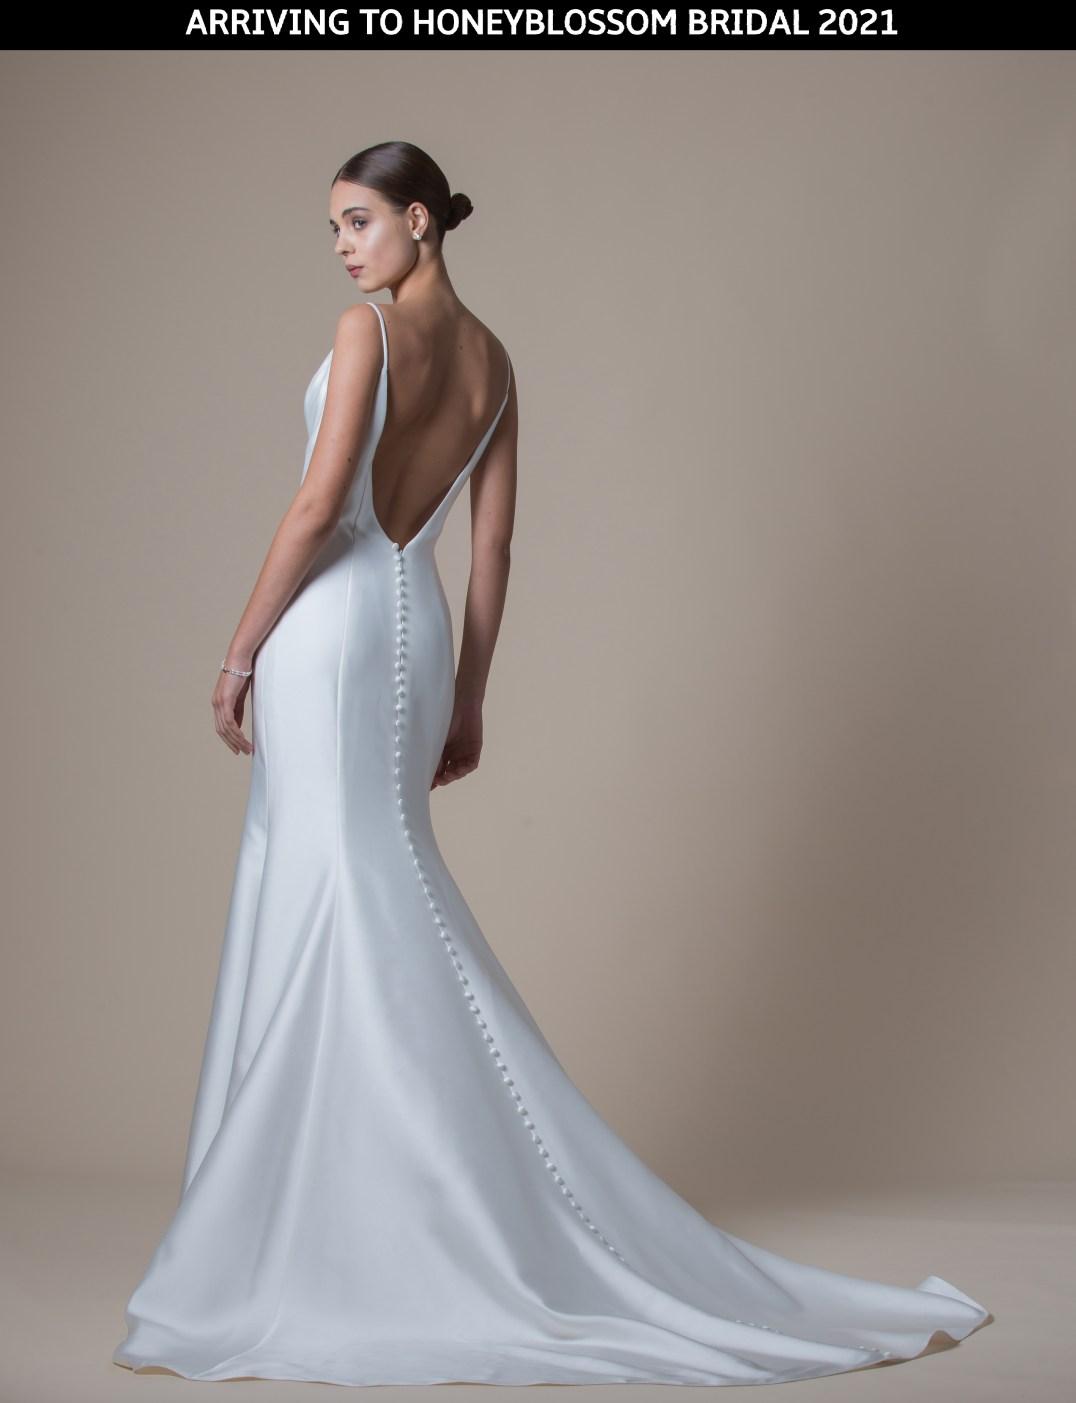 MiaMia Mariah bridal gown arriving soon to Honeyblossom Bridal